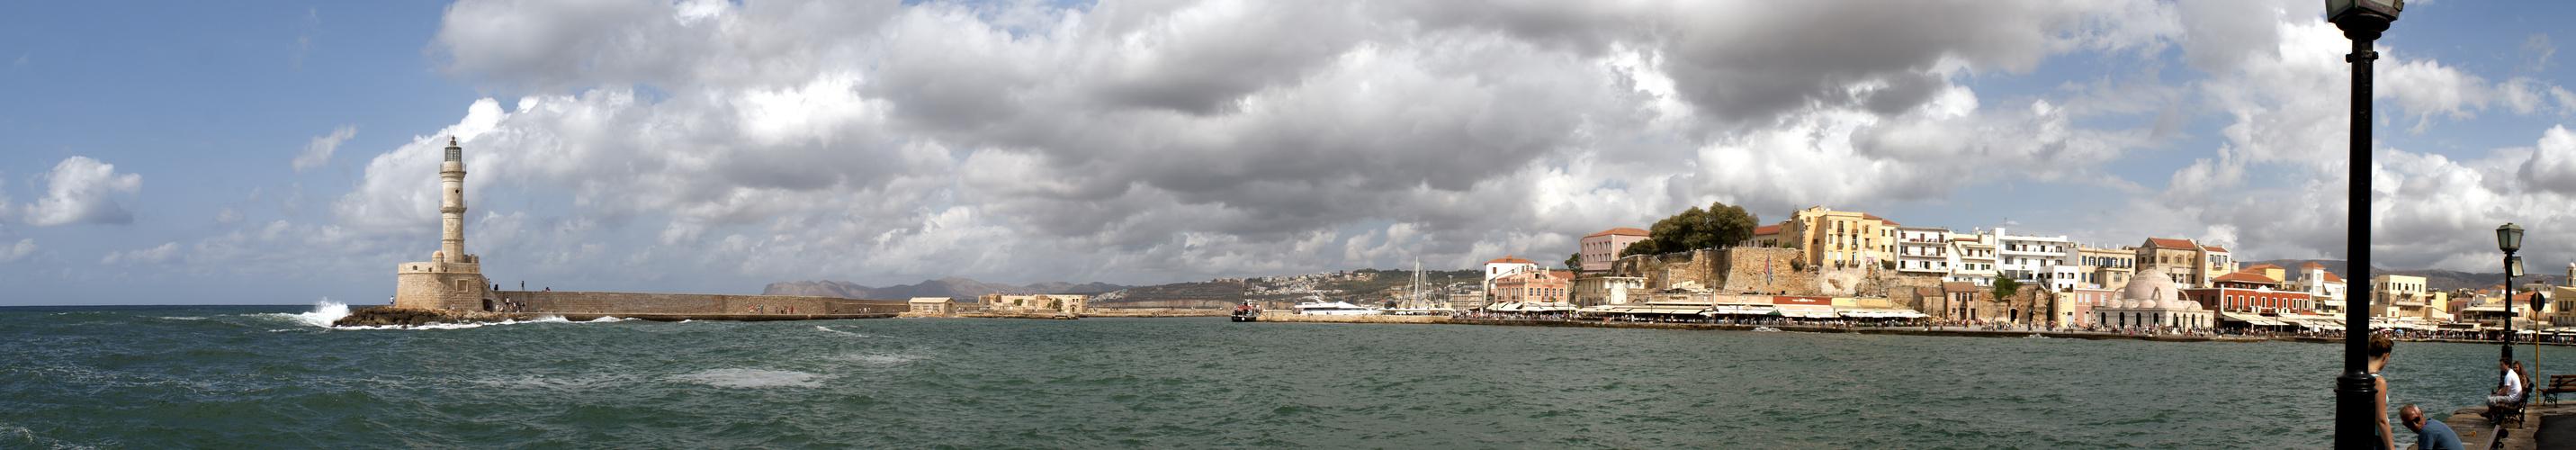 Chania Harbour Panorama